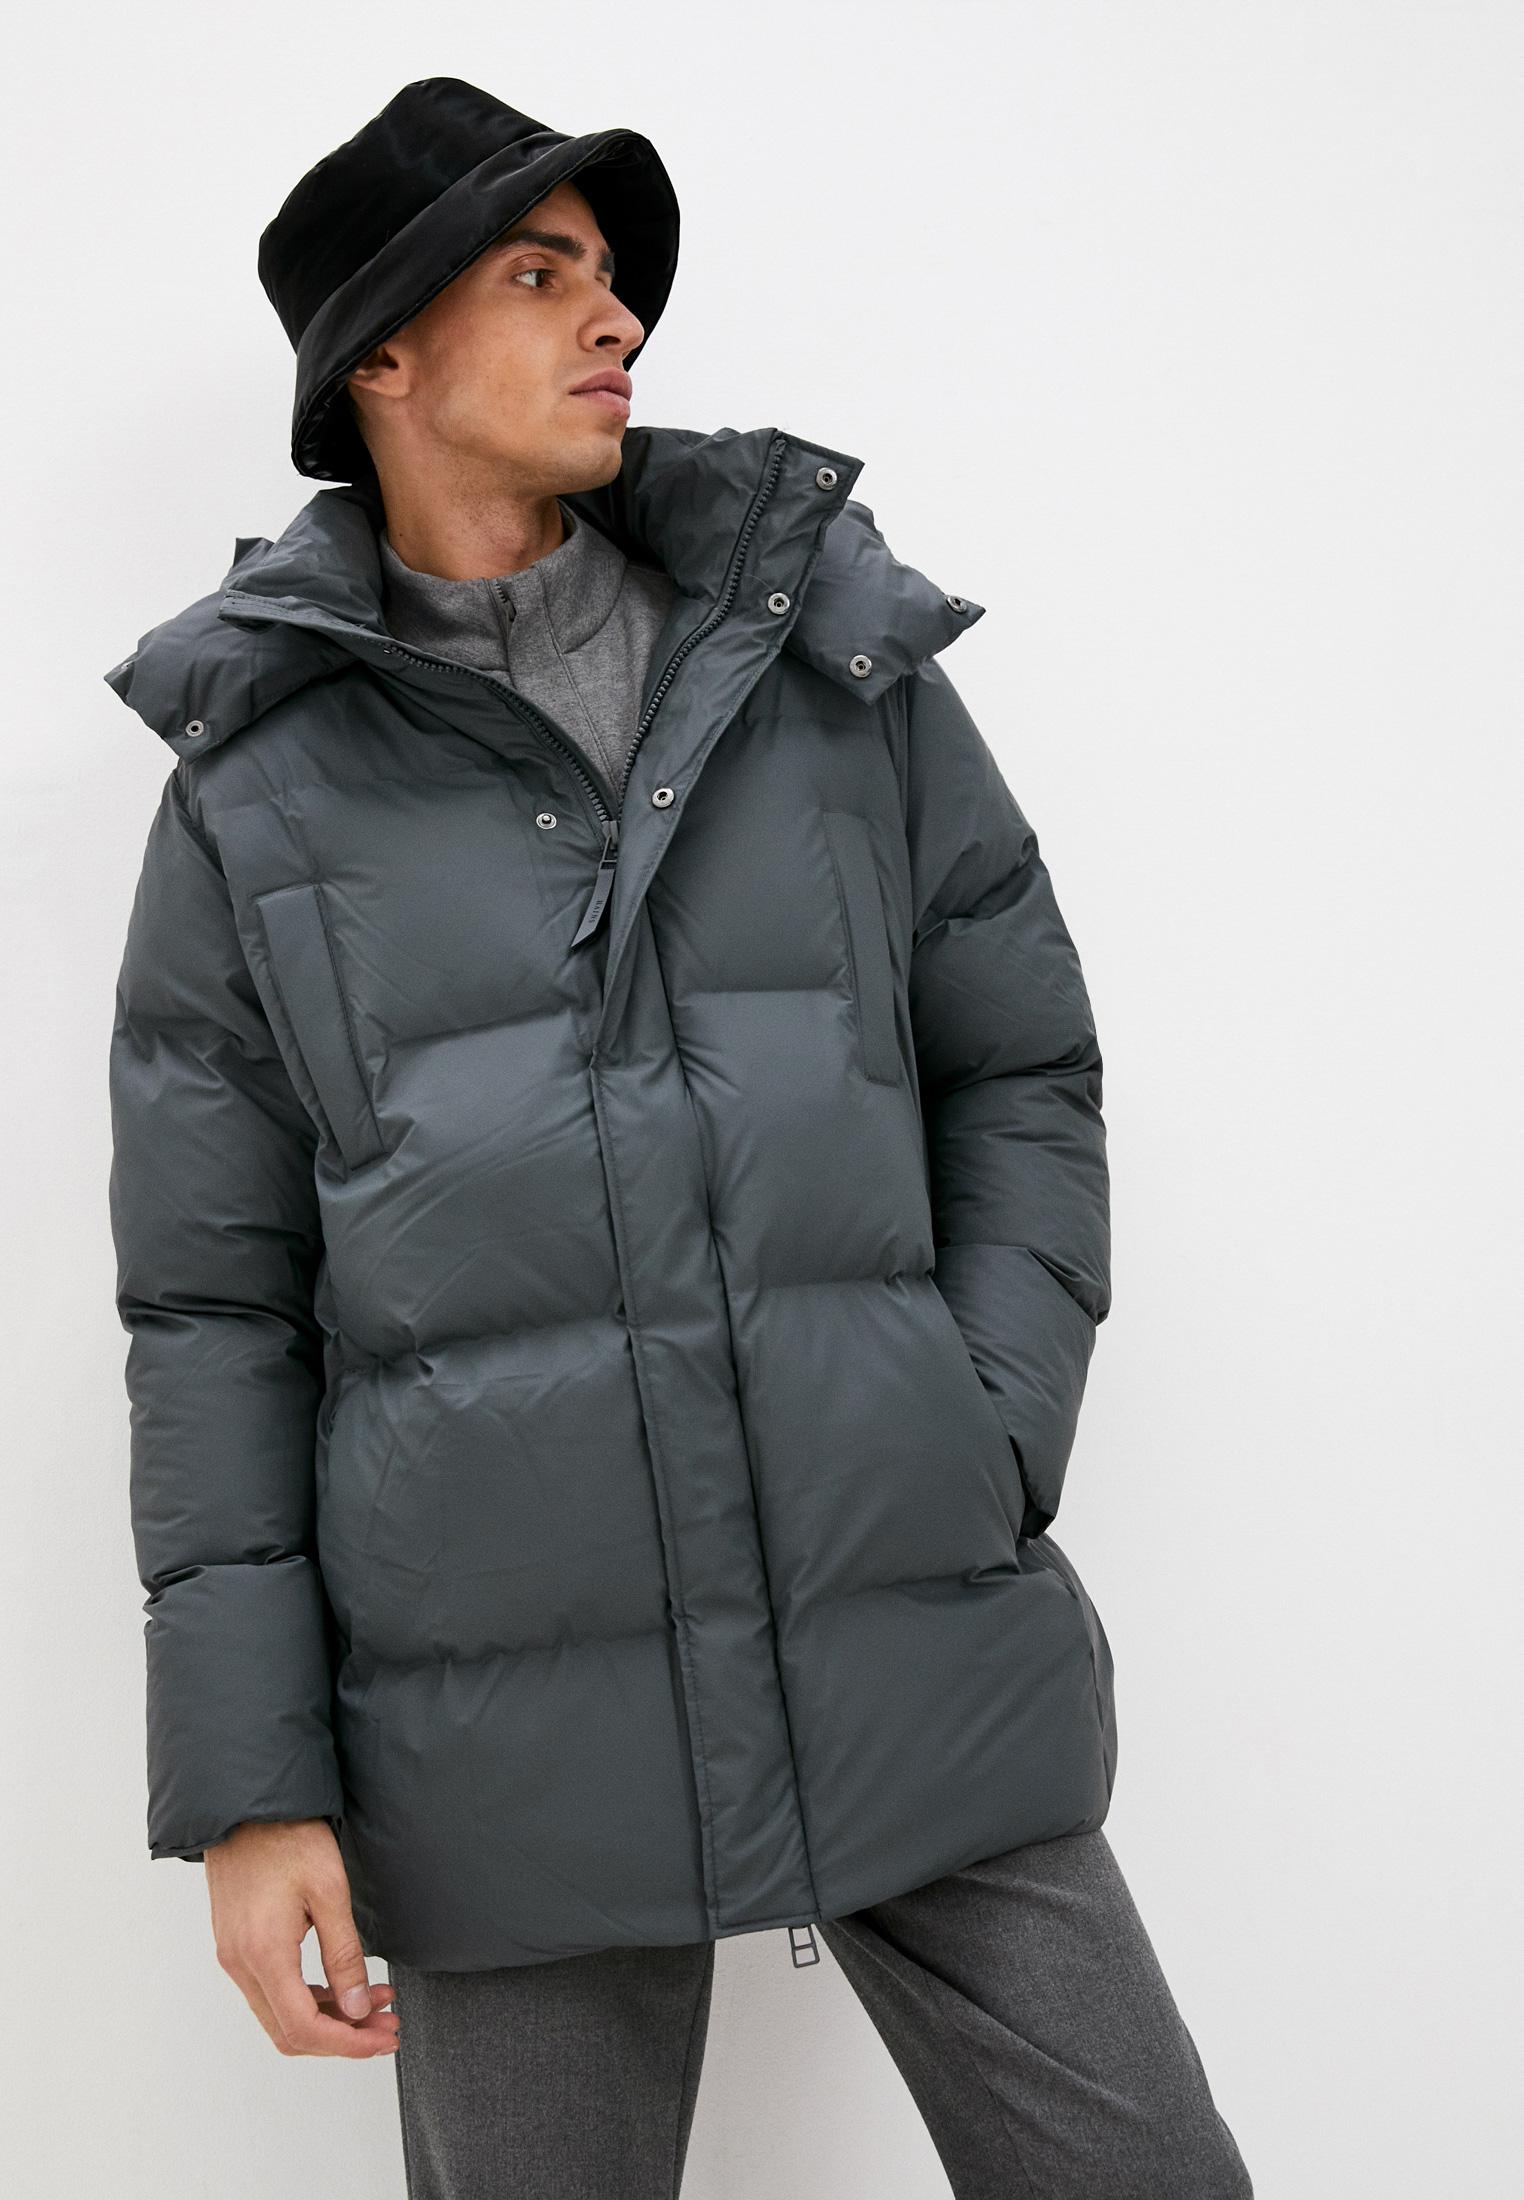 Утепленная куртка Rains Куртка утепленная Rains